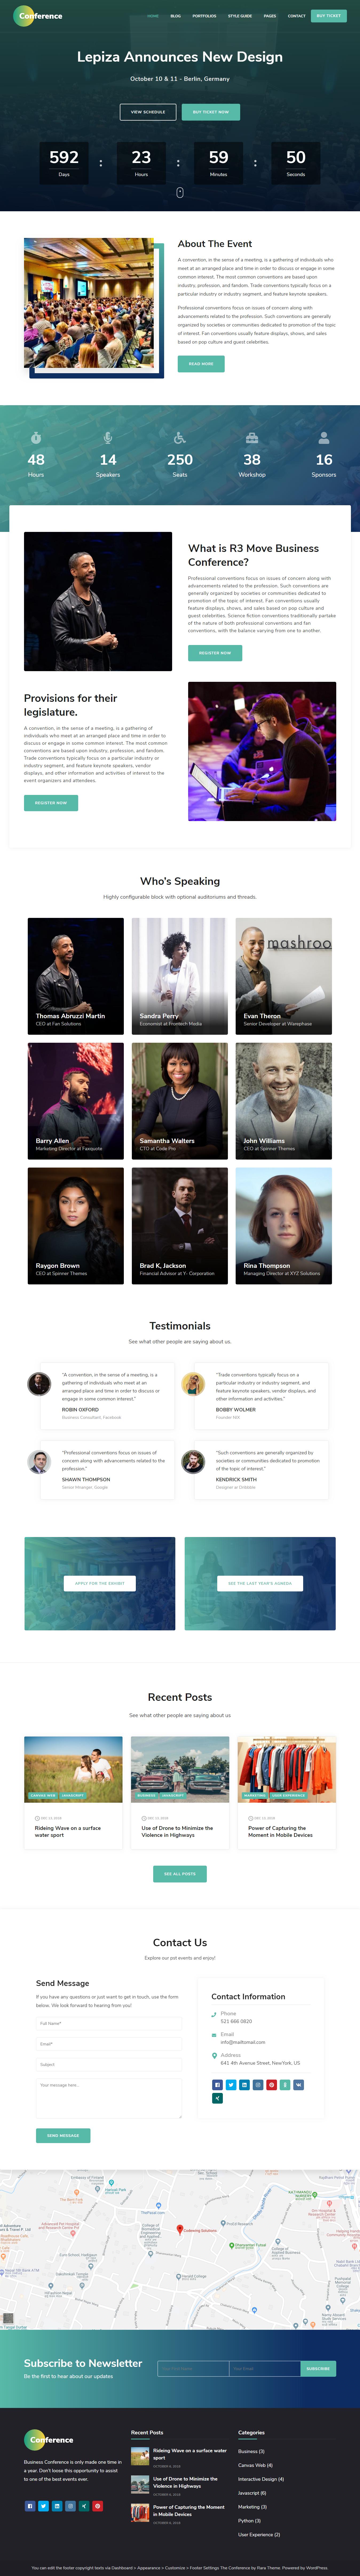 The Conference - Mejor tema de WordPress gratuito para agencias de SEO